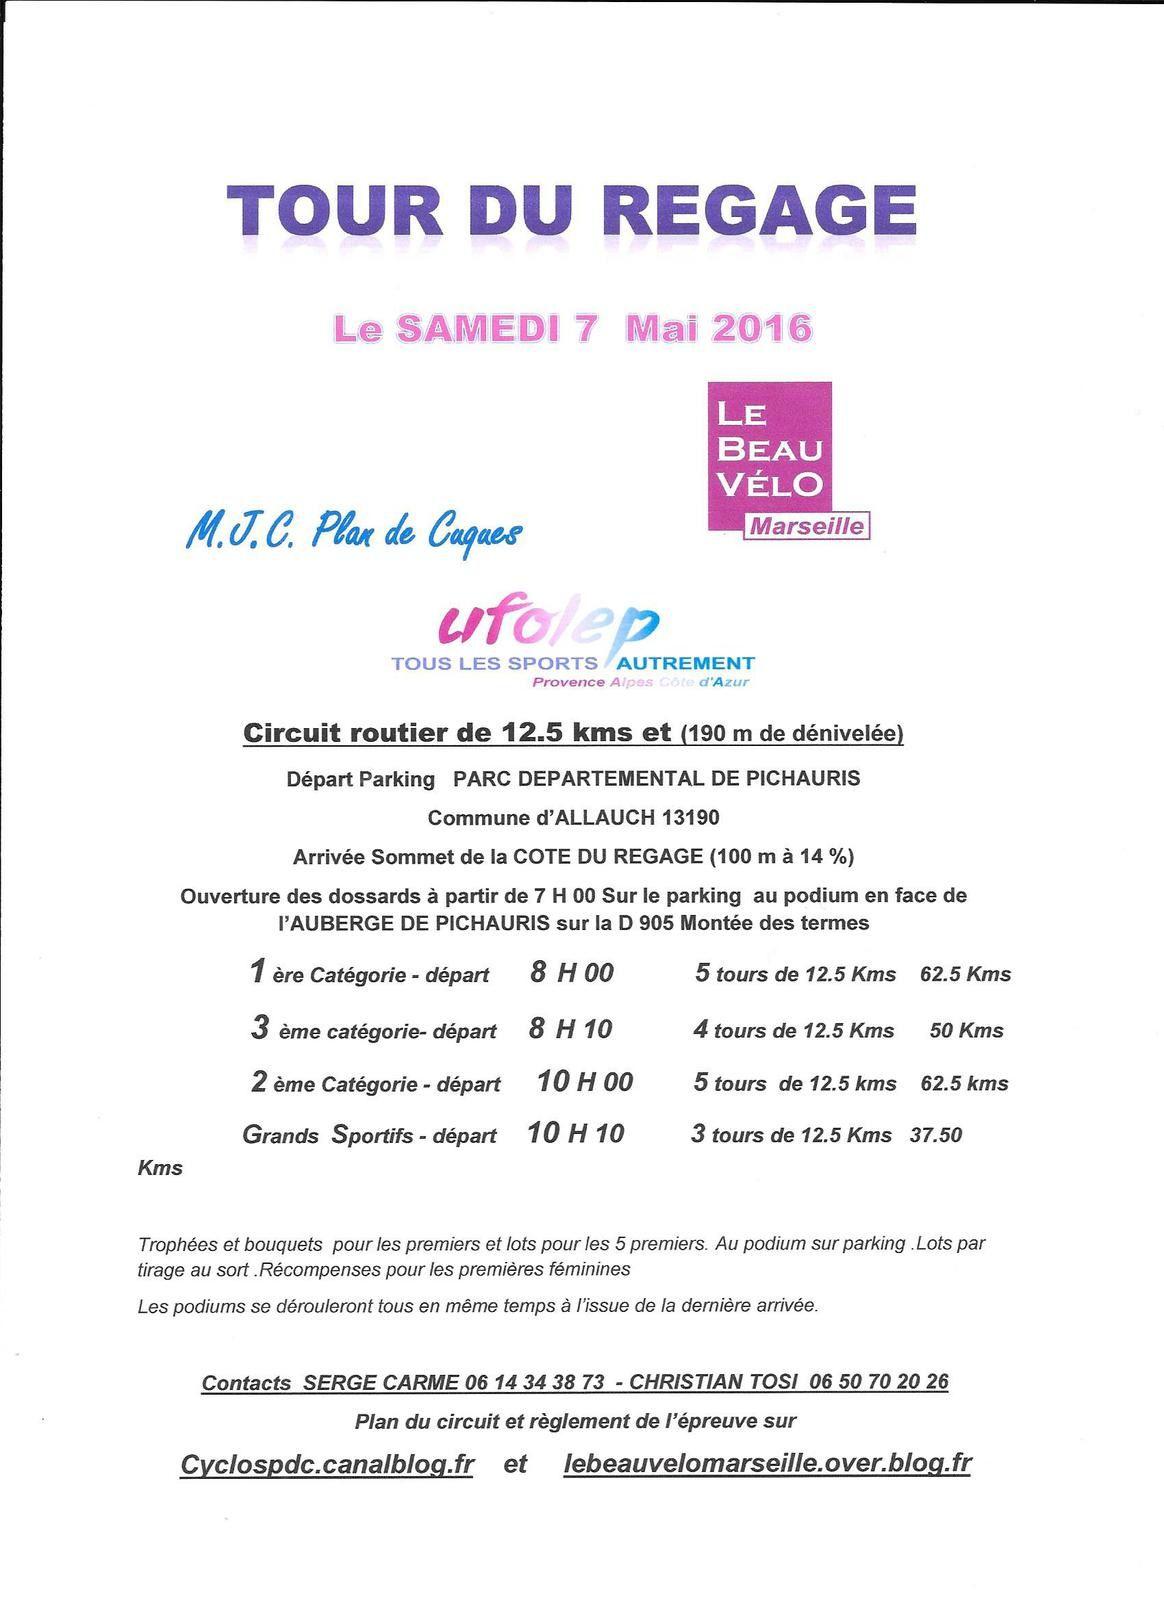 TOUR DU REGAGE  SAMEDI 17 MAI 2016